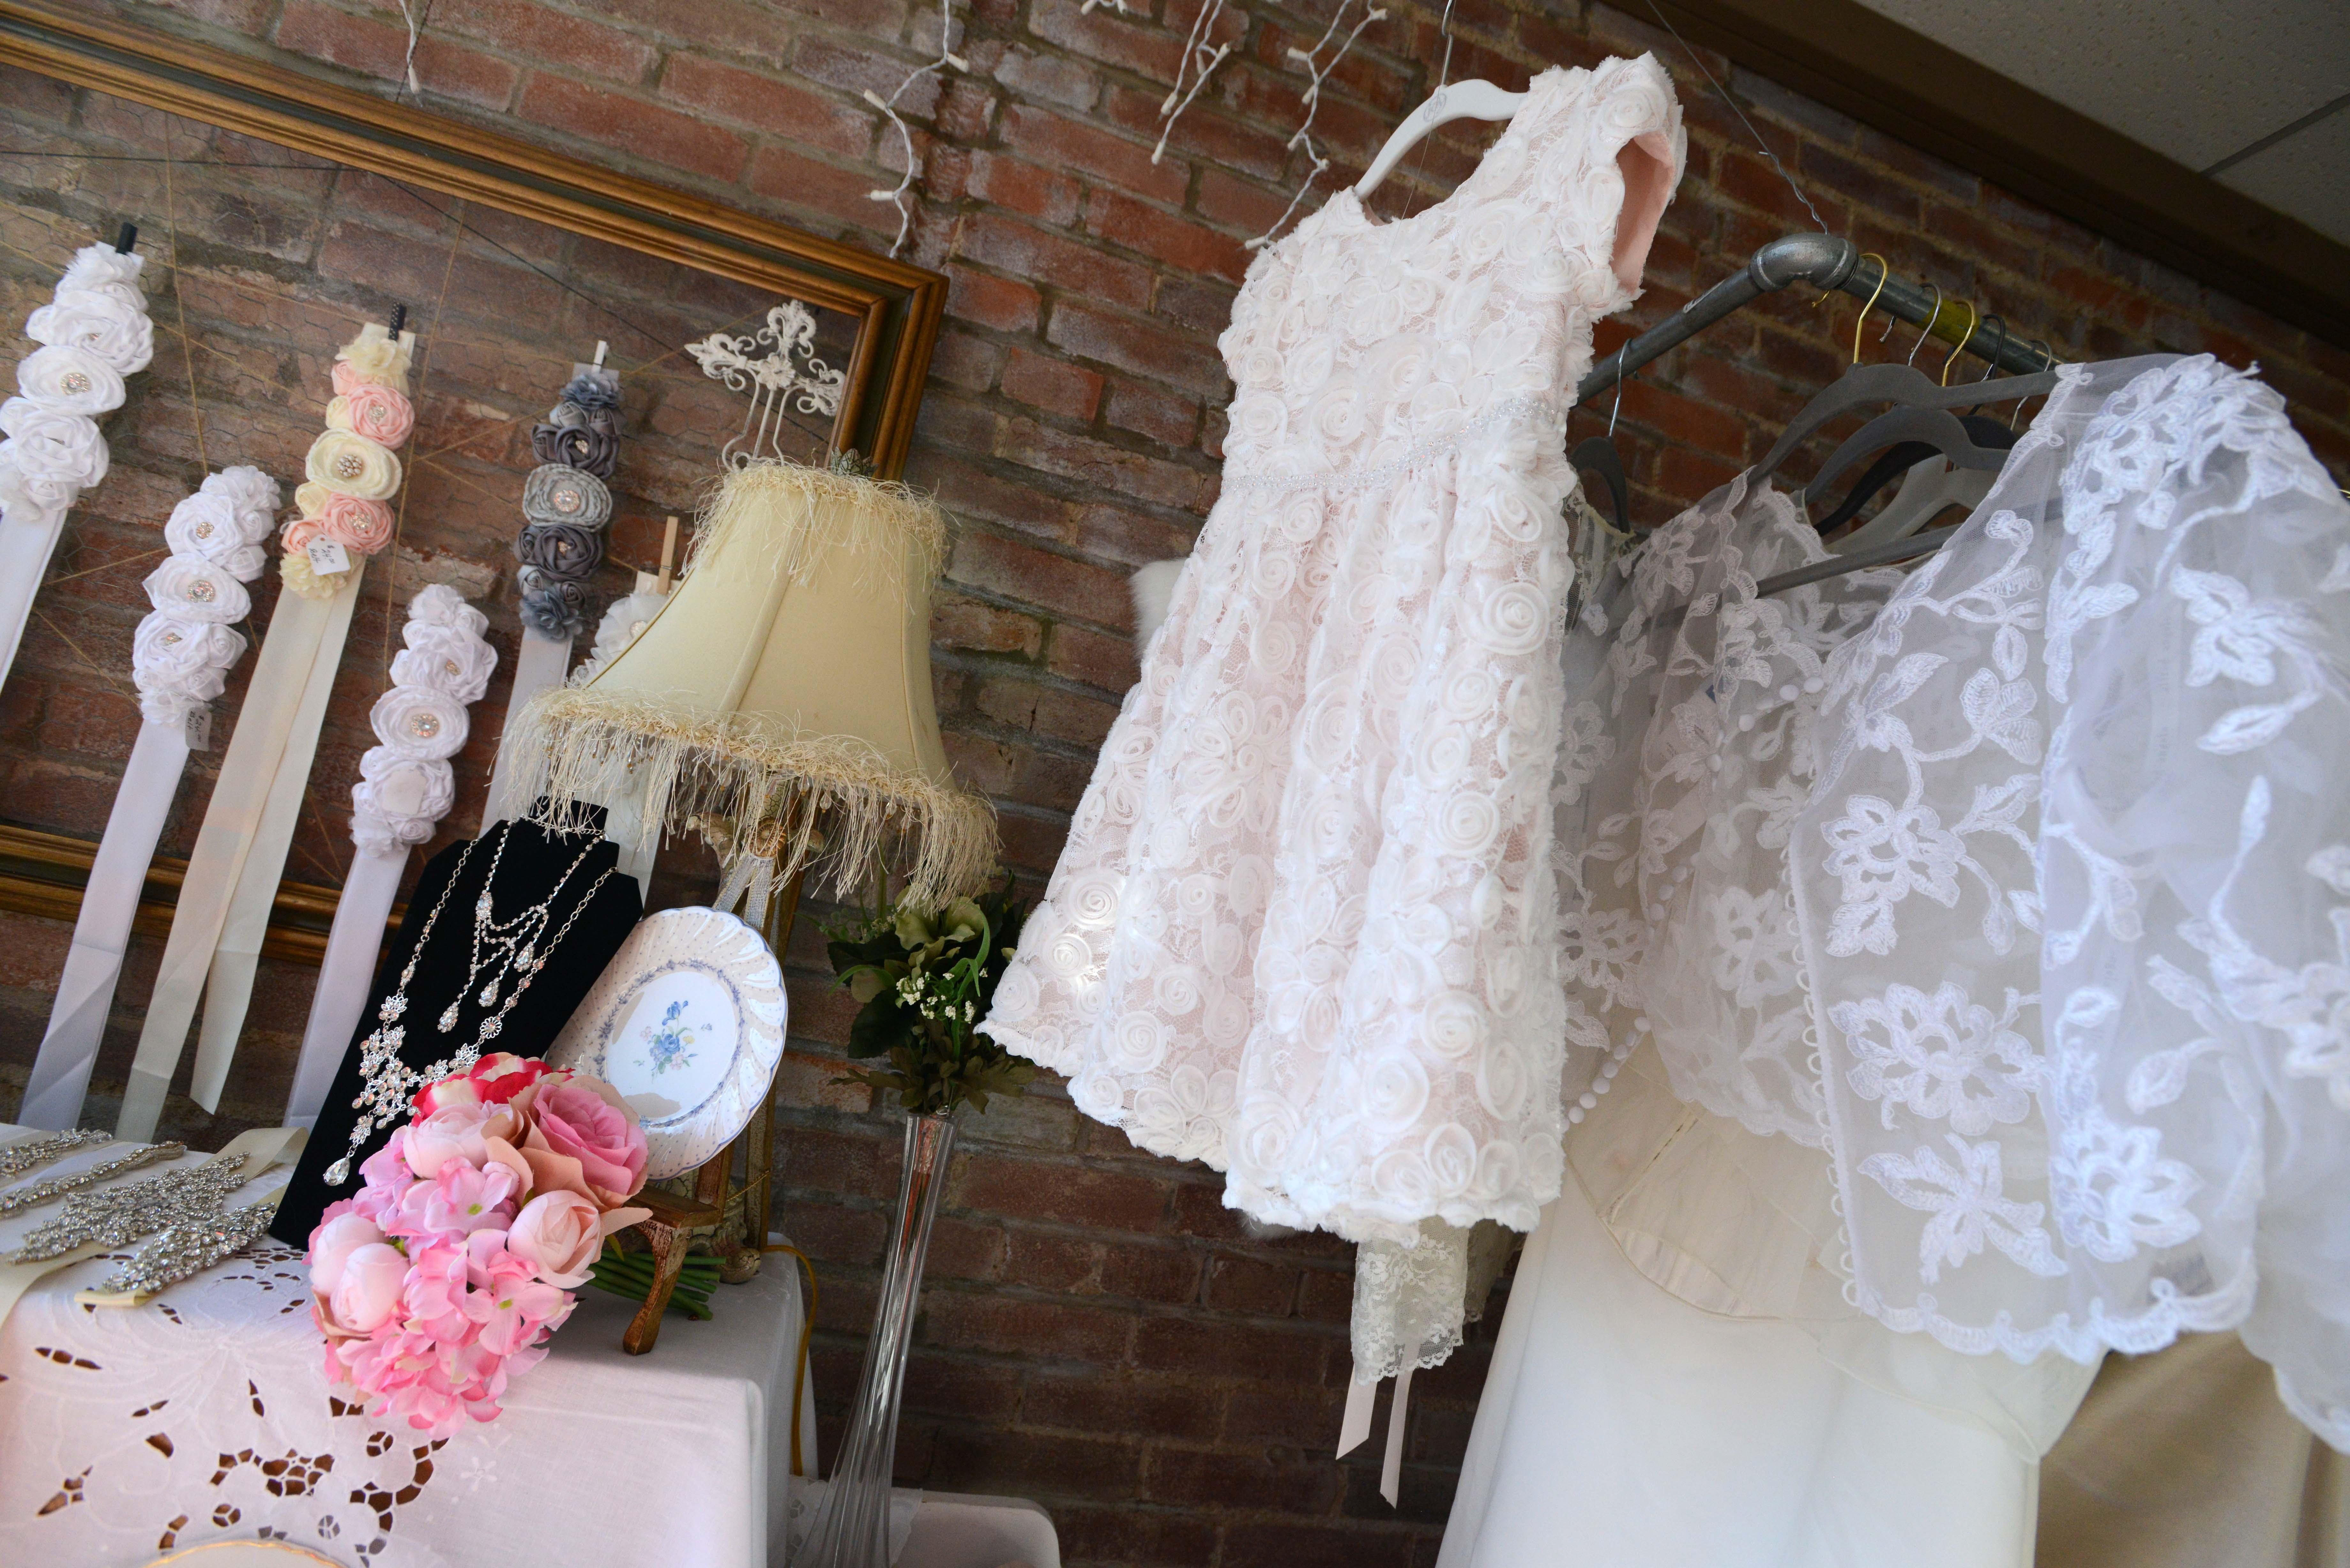 Wedding dress resale shop stays busy in